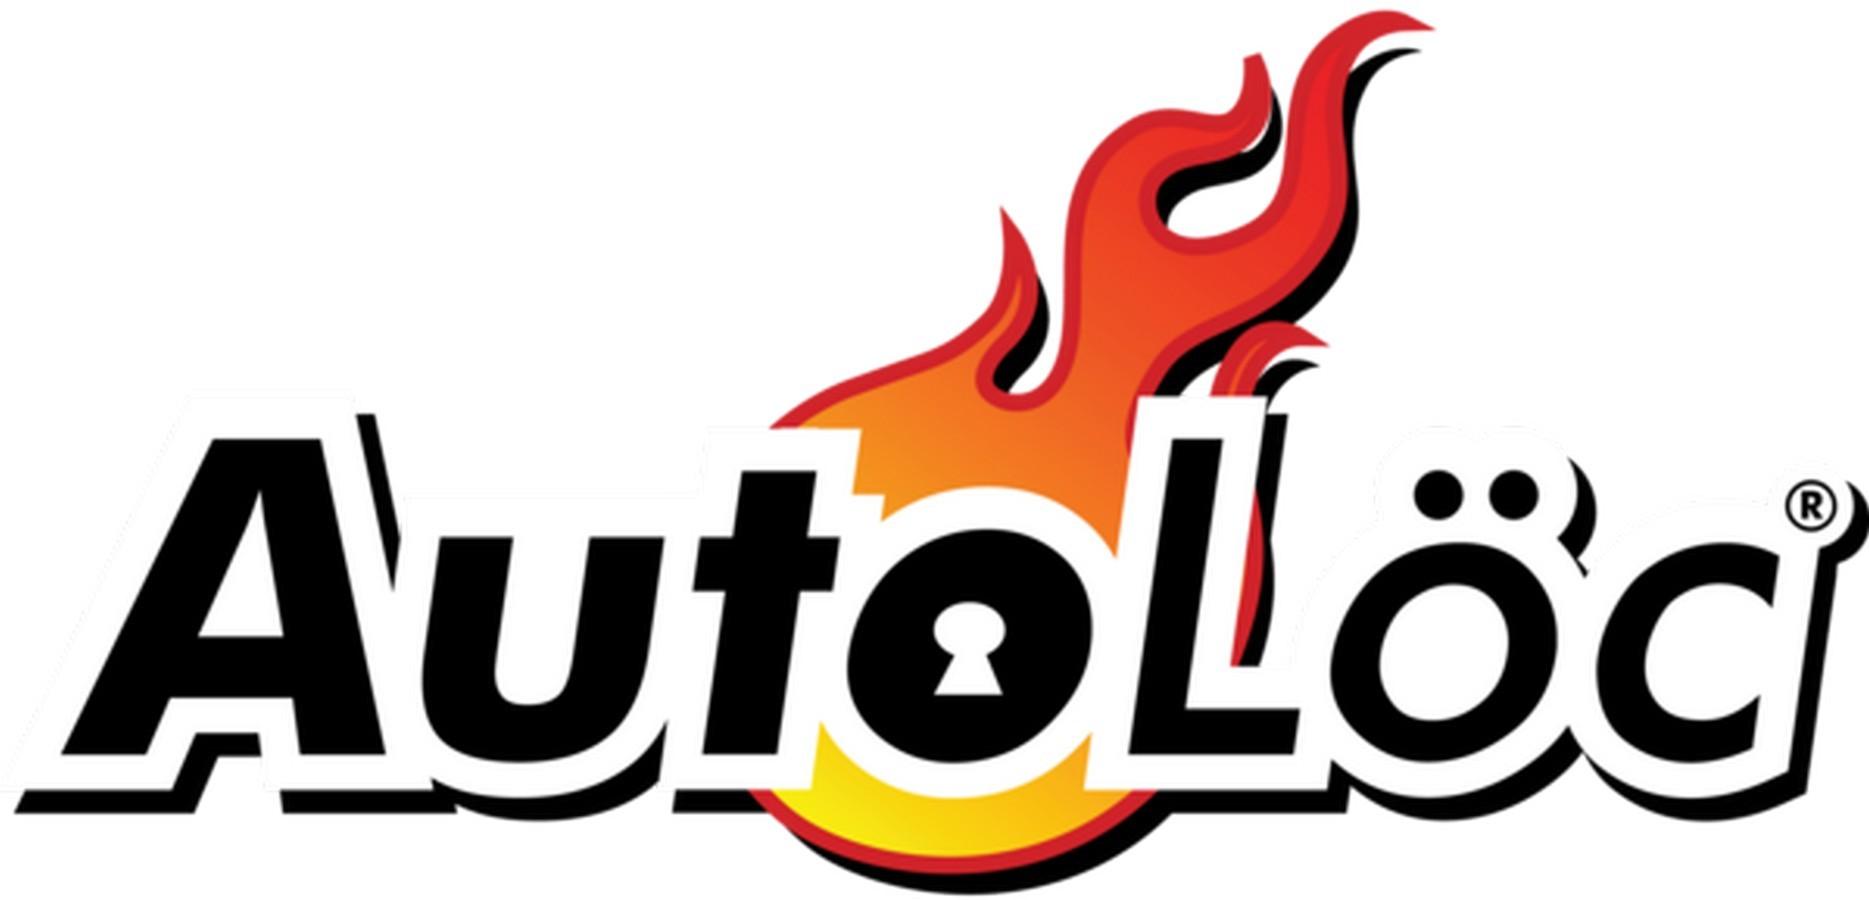 Auto-loc AutoLoc 2013